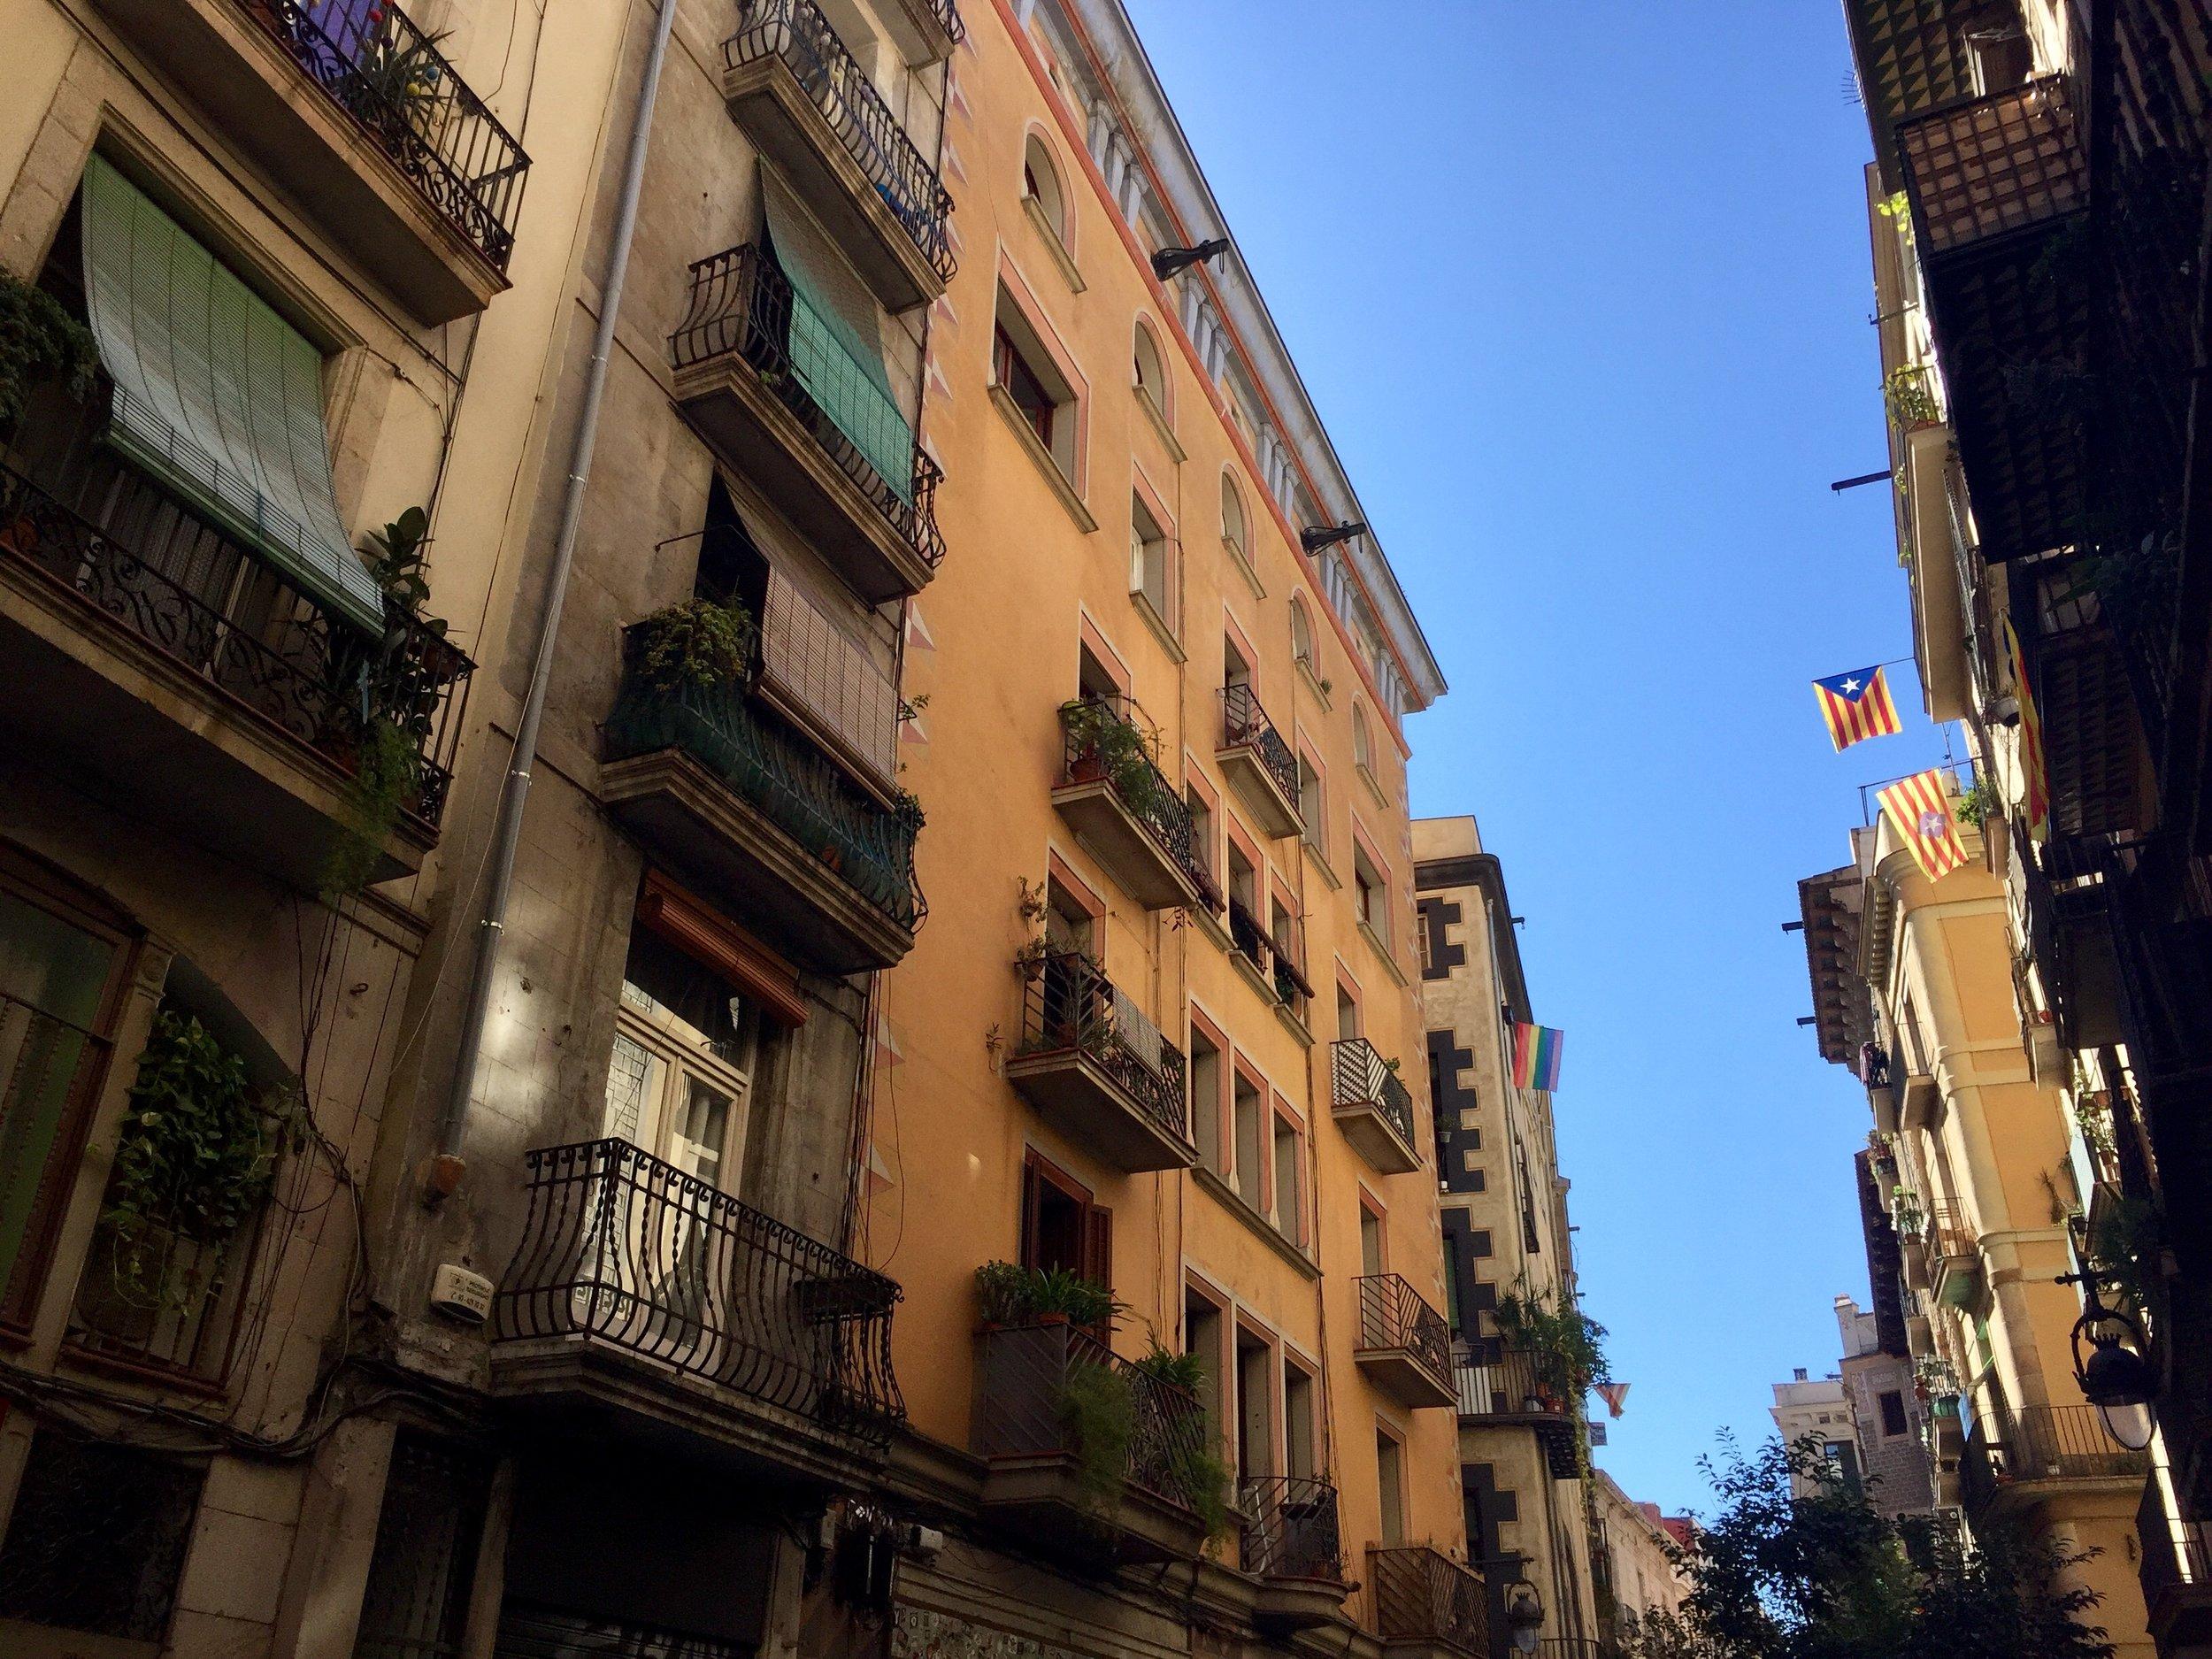 Barcelona Spain street view.jpg